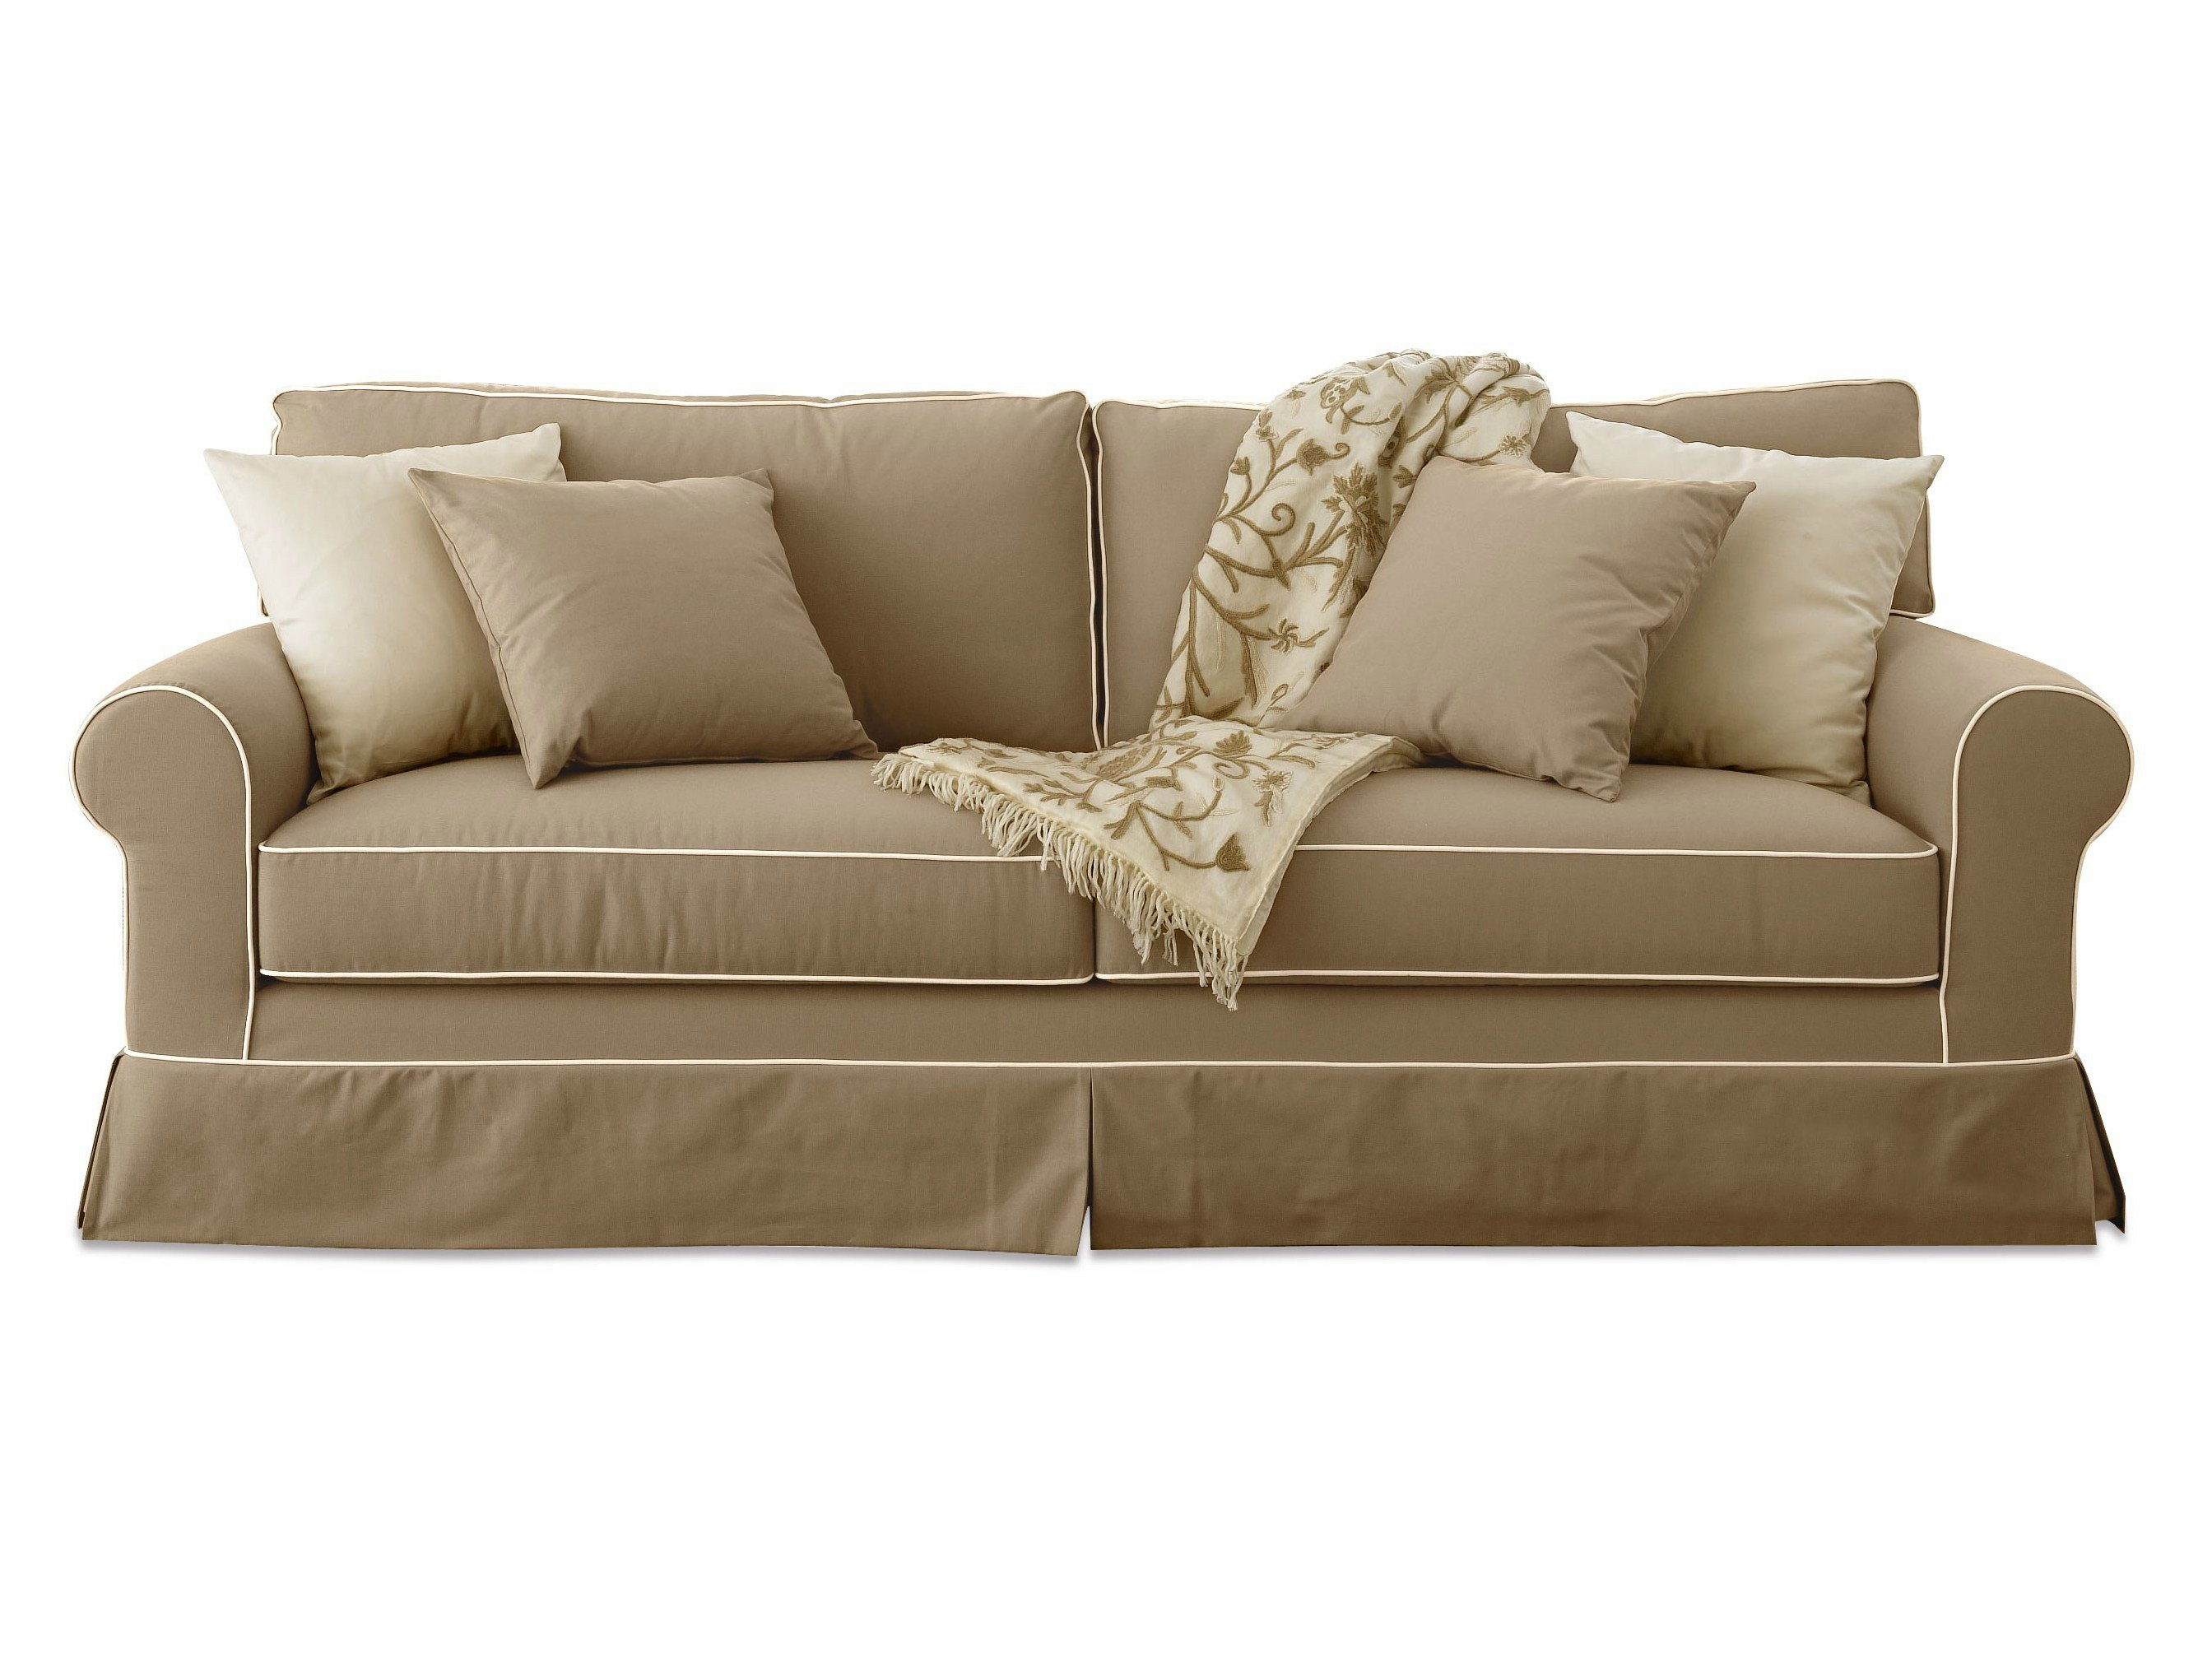 Sofabett holz  BAHAMAS | Sofa By Cantori